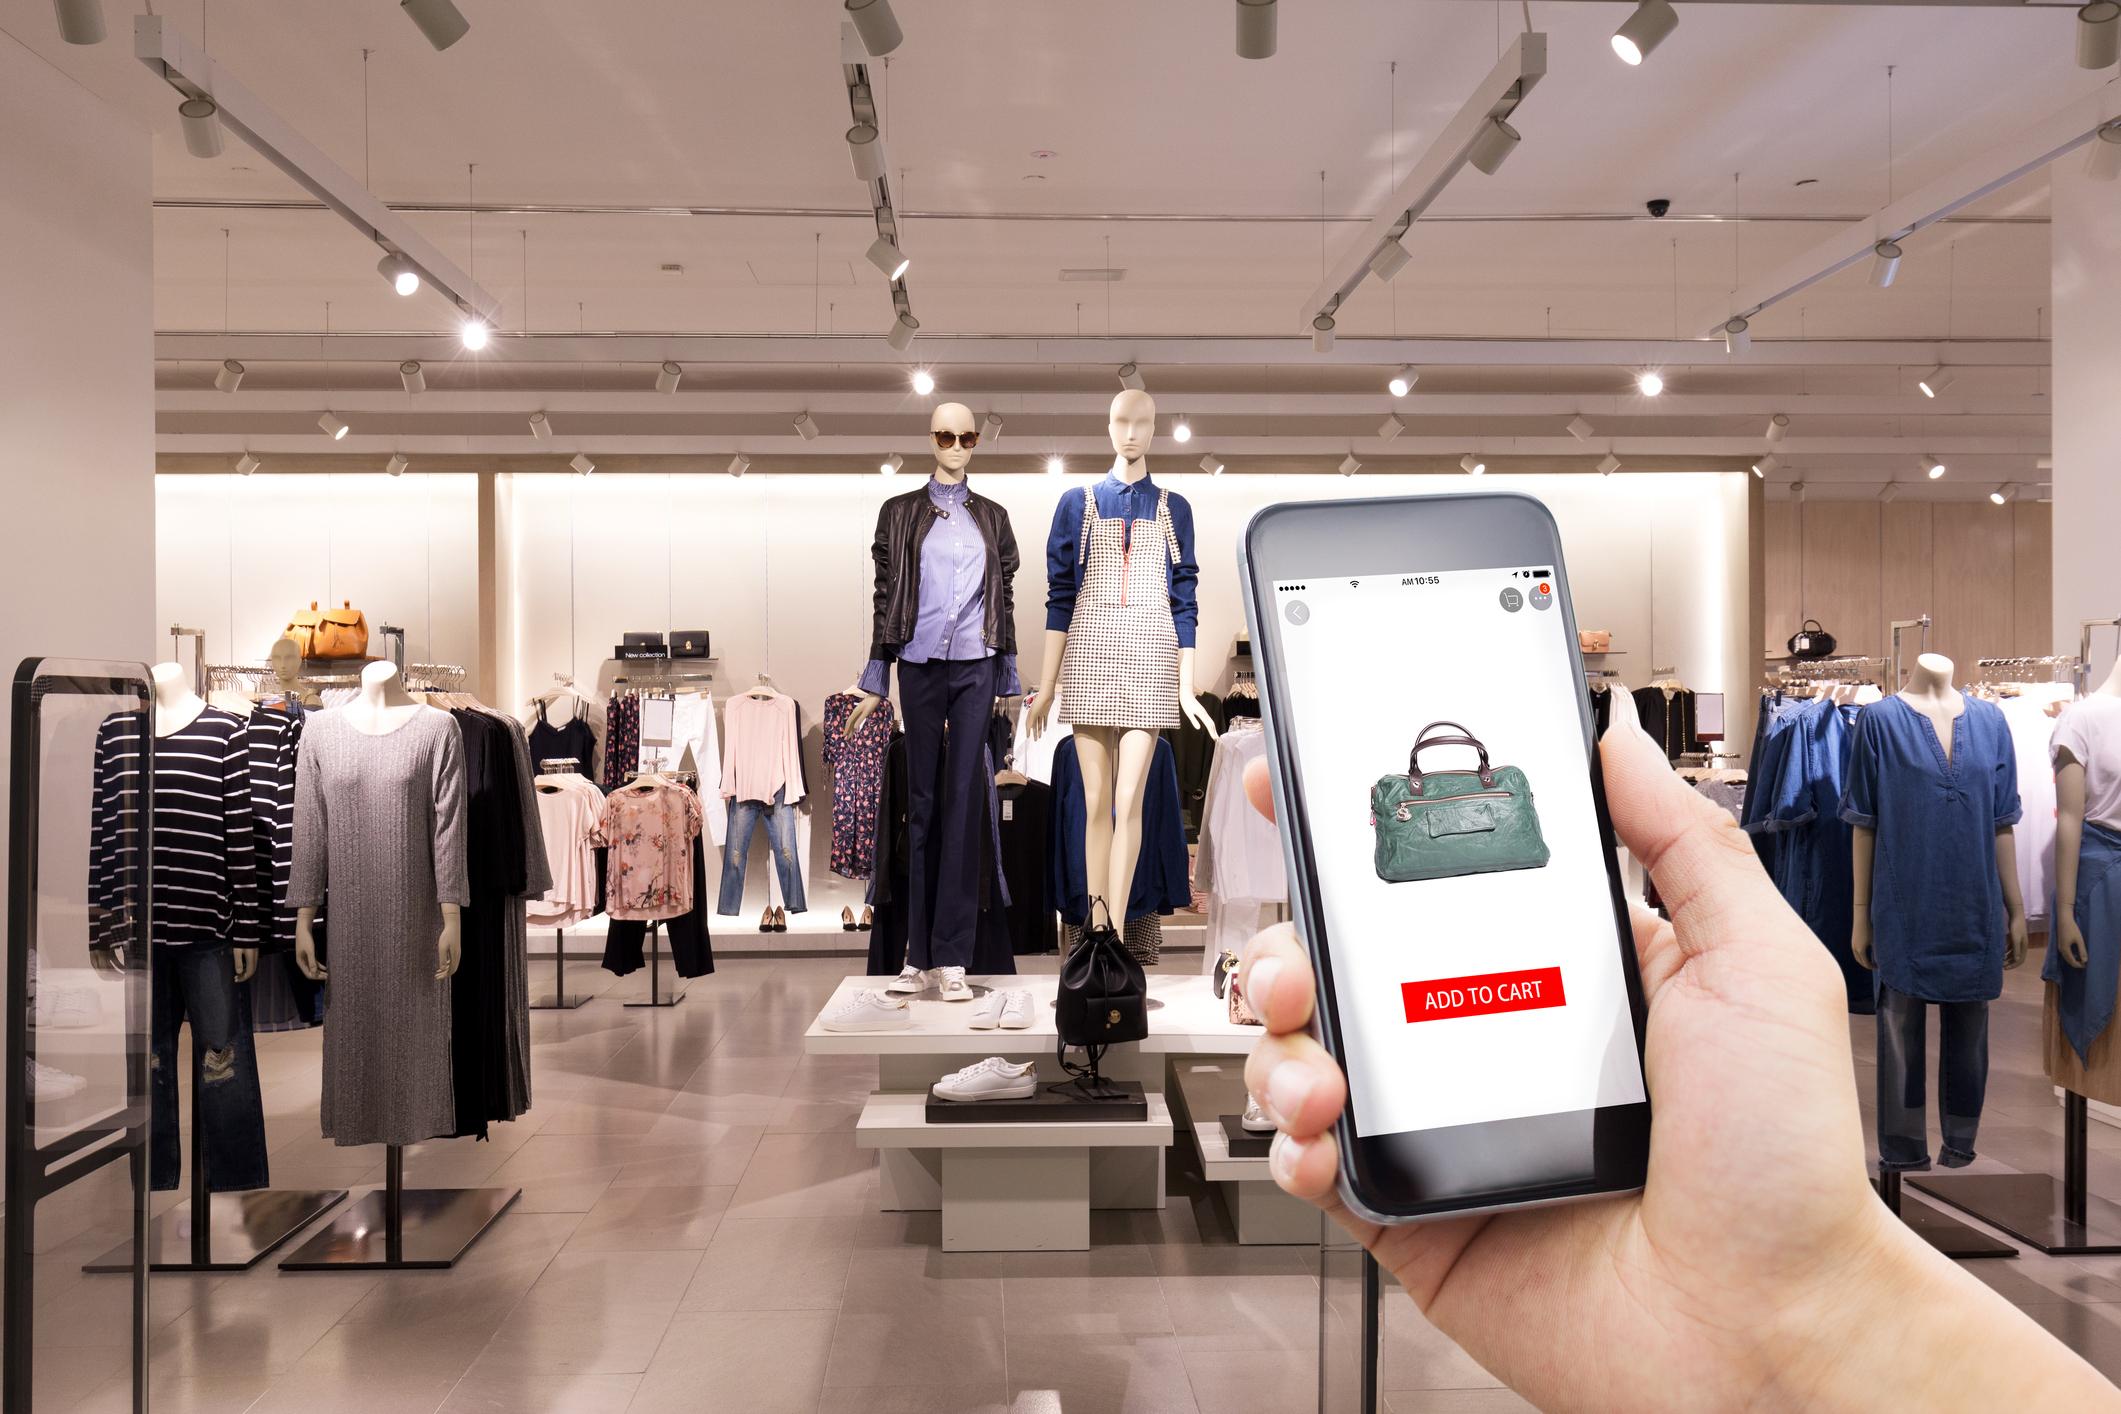 A shopper checks a handbag's price on a smartphone app.